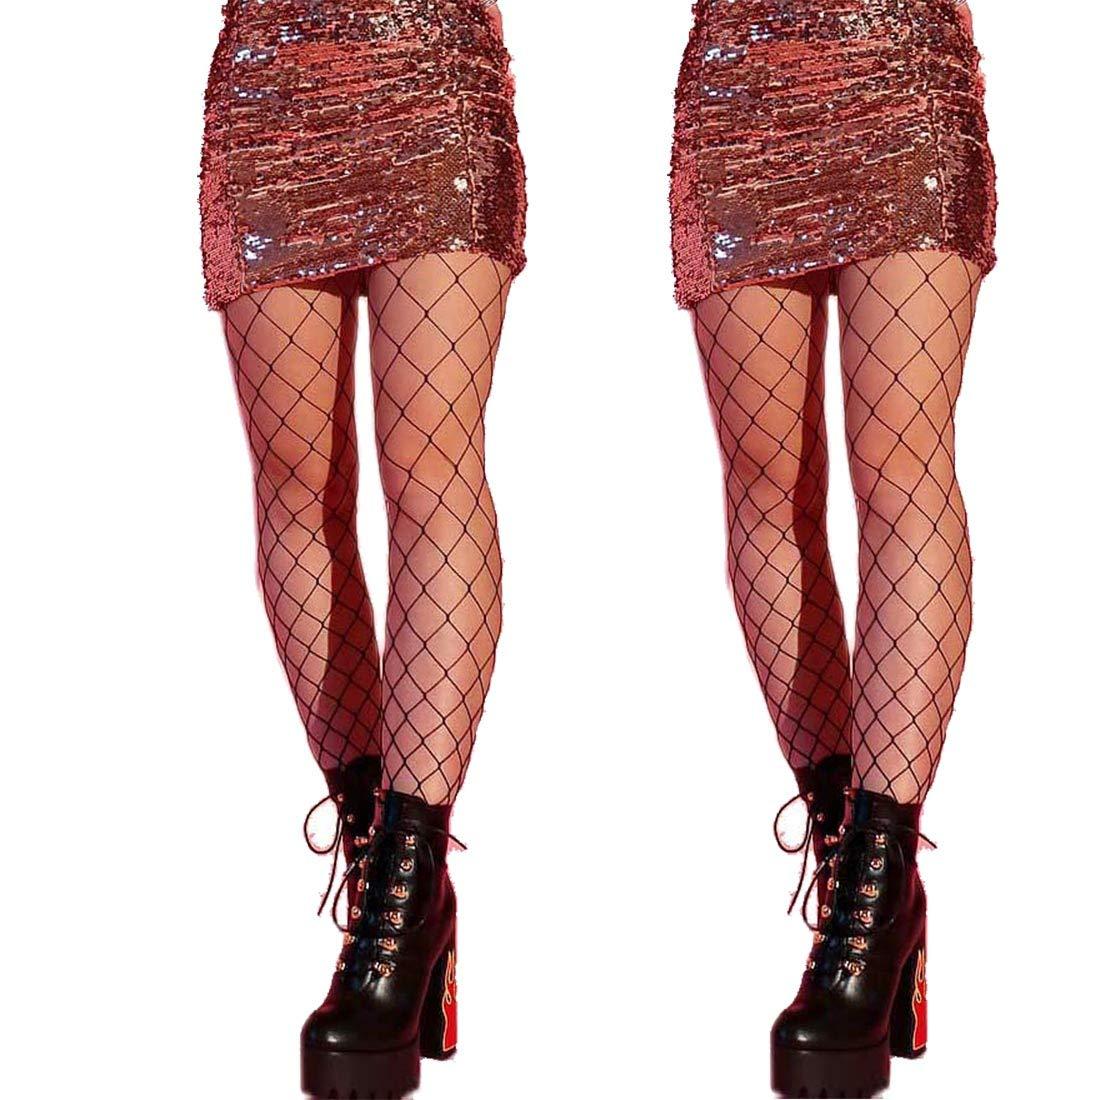 DancMolly Fishnet Stockings Pantyhose Women's 2 Pair High Waist Hollow Mesh Tights Legging Hosiery